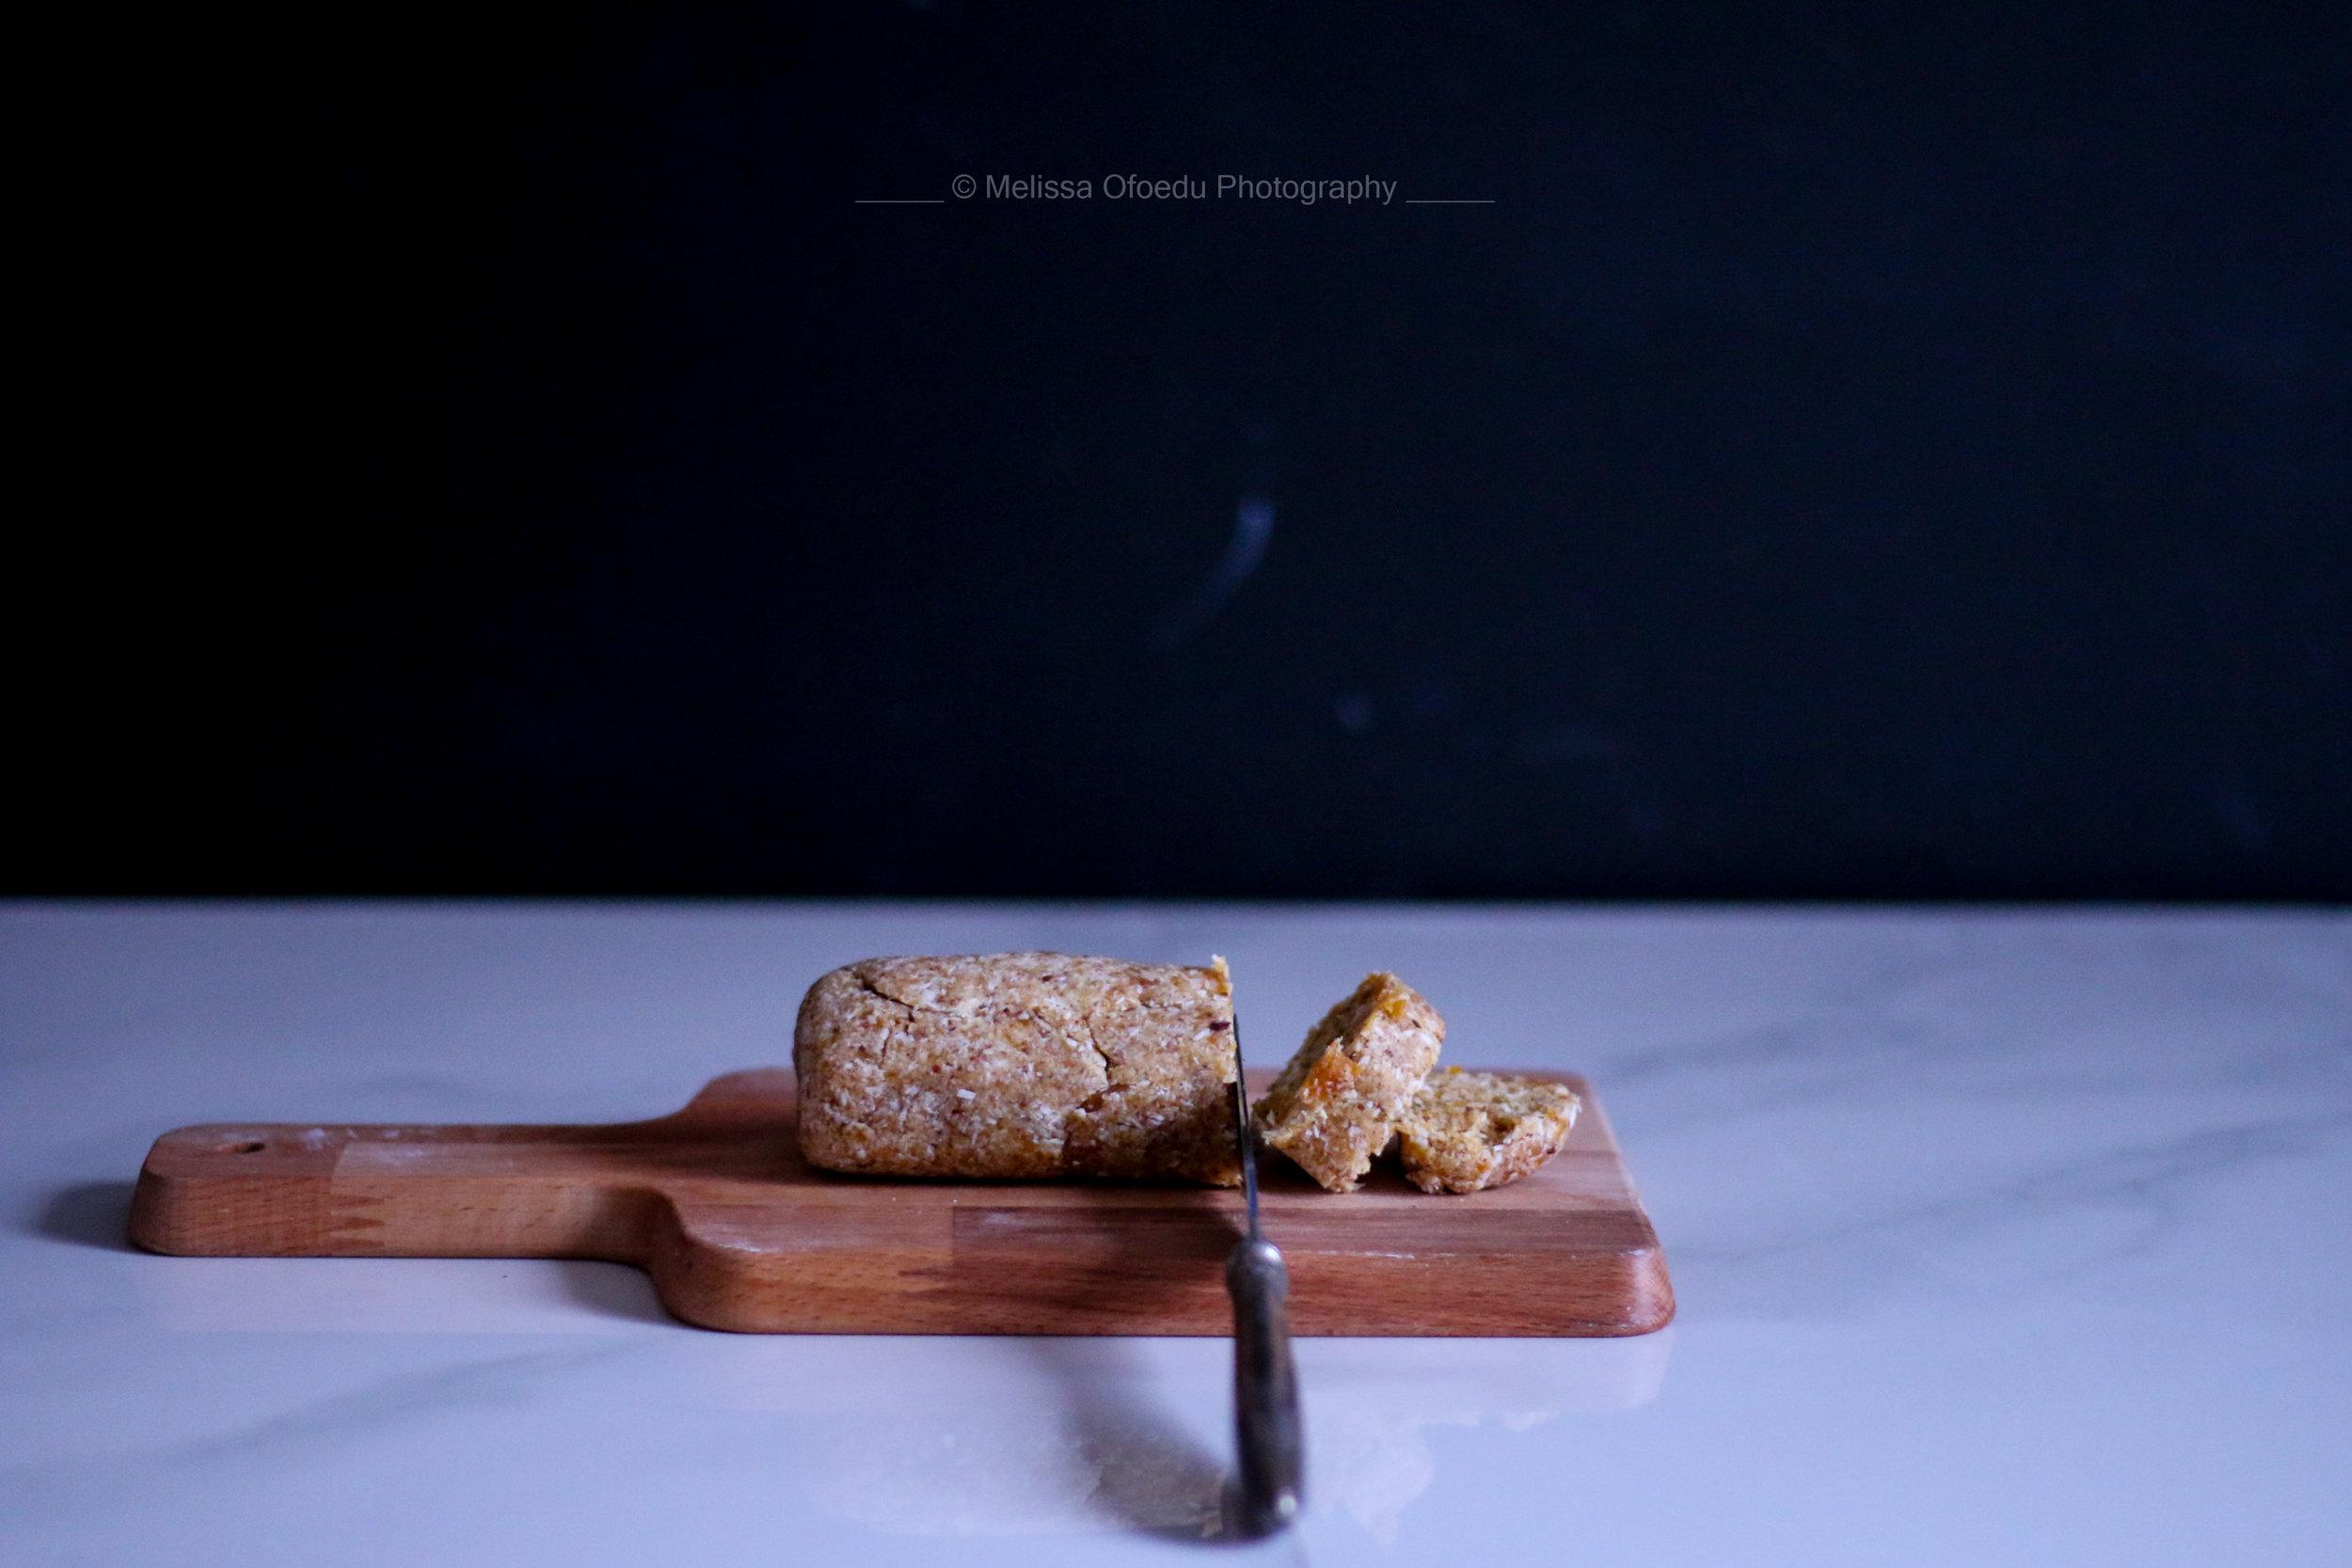 raw-vegan-krembos-melissa-ofoedu-photography-for-a-sweet-point-of-view-4-von-1